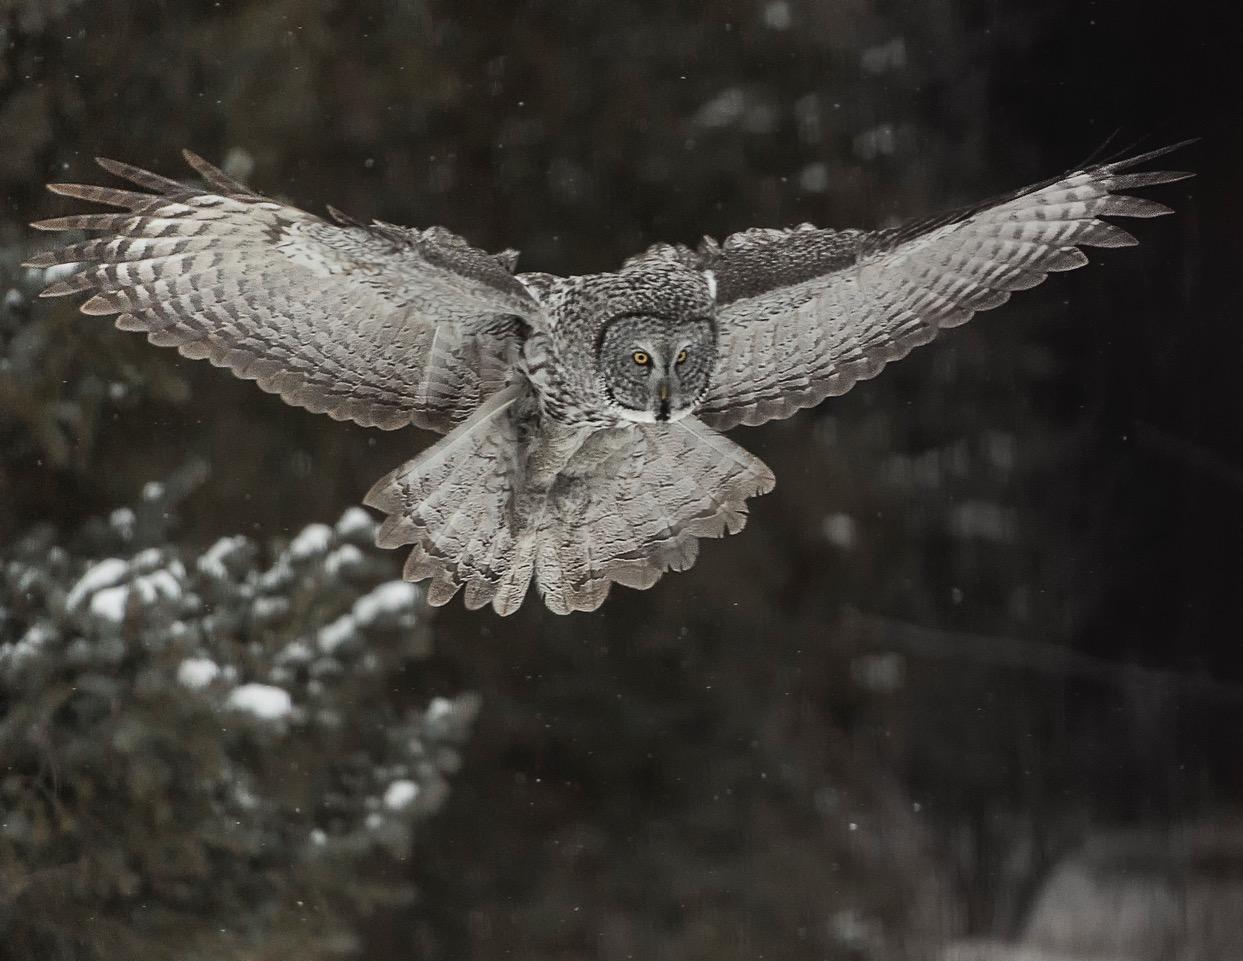 _DSC4481_Soaring Owl_Crop11x8.5 300dpi_v2.jpeg